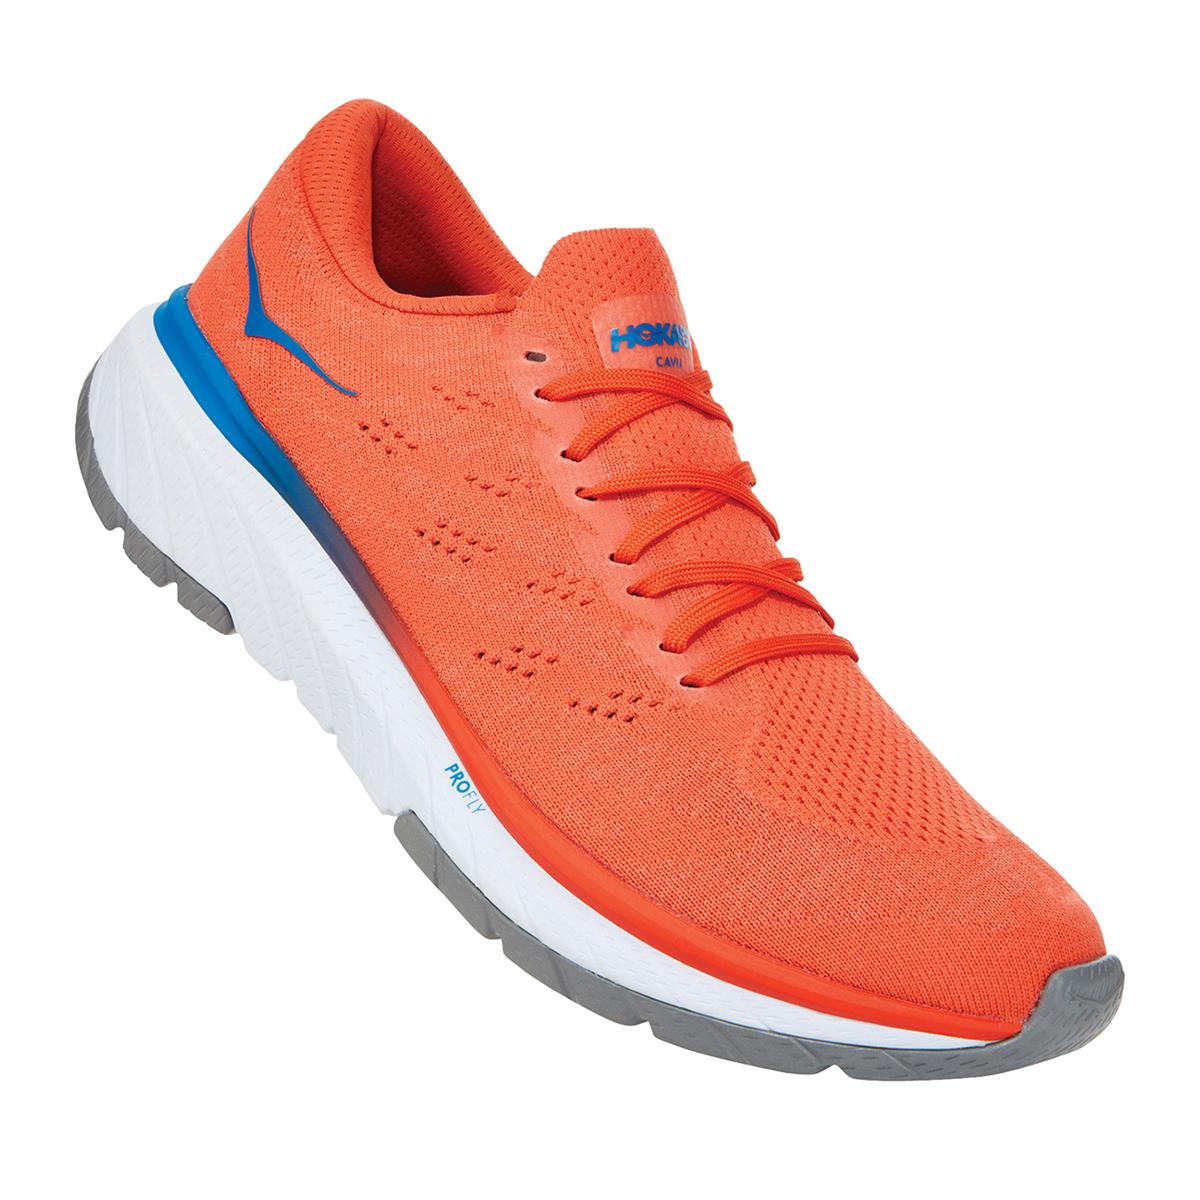 Men's Hoka One One Cavu 3 Running Shoe - Color: Mandarin Red/White - Size: 7 - Width: Regular, Mandarin Red/White, large, image 5